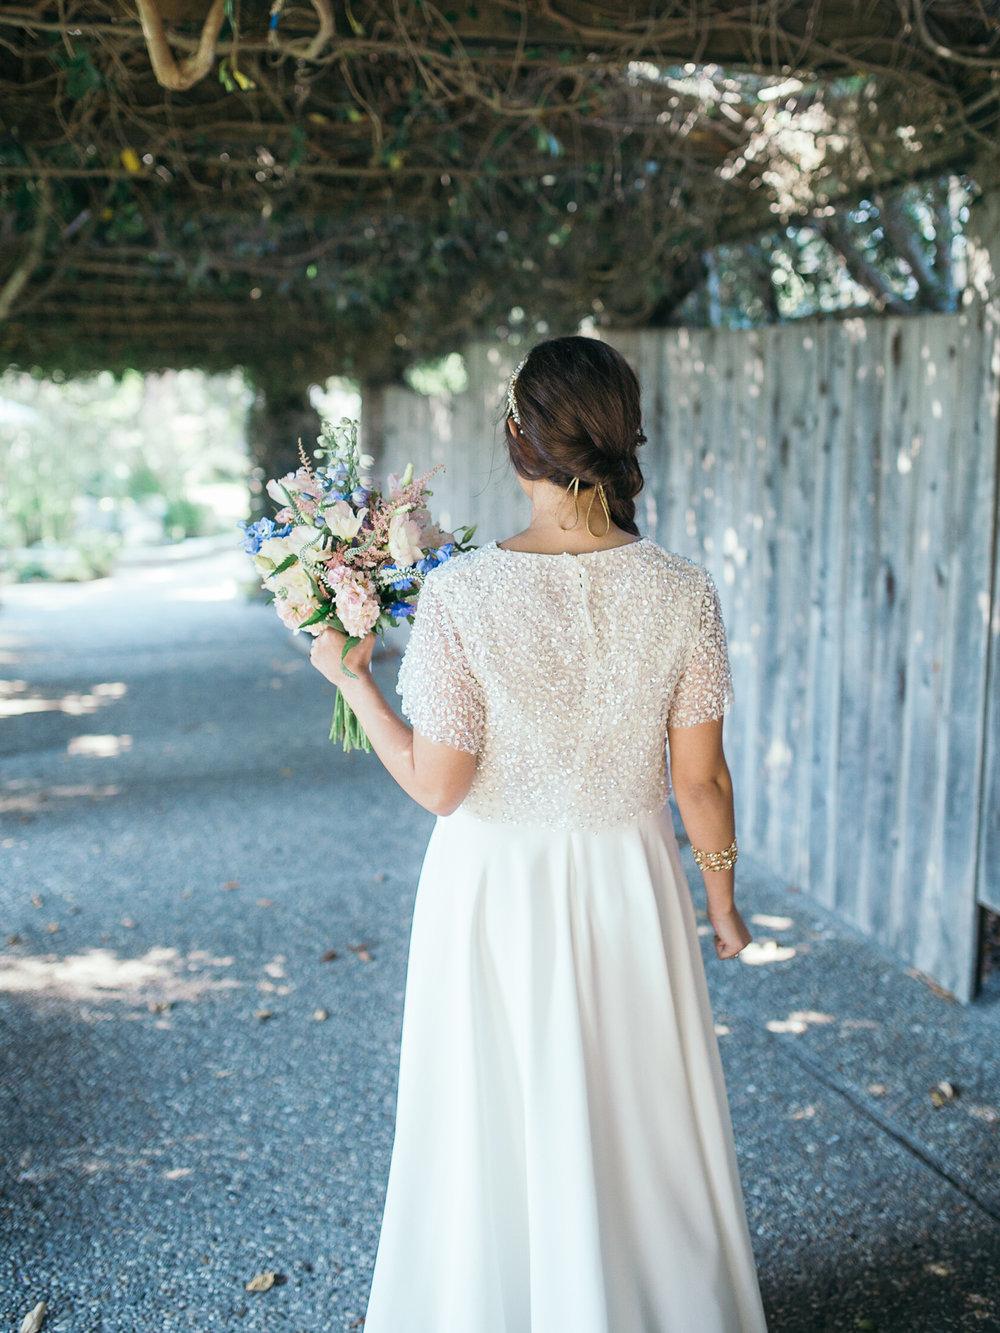 www.santabarbarawedding.com | Santa Barbara Zoo | Kiel Rucker | Rincon Catering | Bride